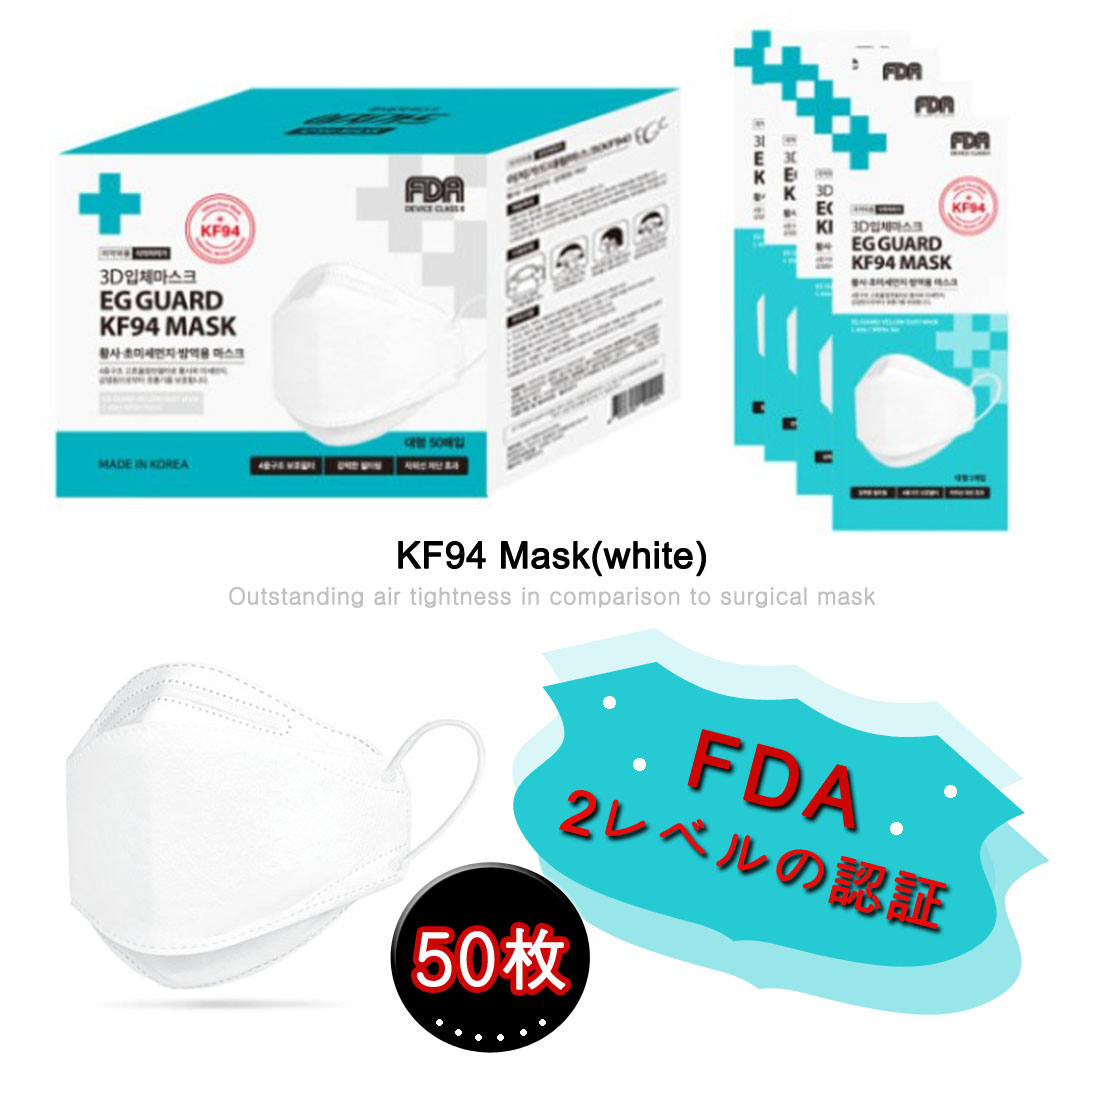 <title>FDA2レベルの認証 kf94 マスク 50枚 1枚入x50包 個別包装 韓国防疫マスク いよいよ人気ブランド 韓国製 韓国 使い捨て 海外直送</title>